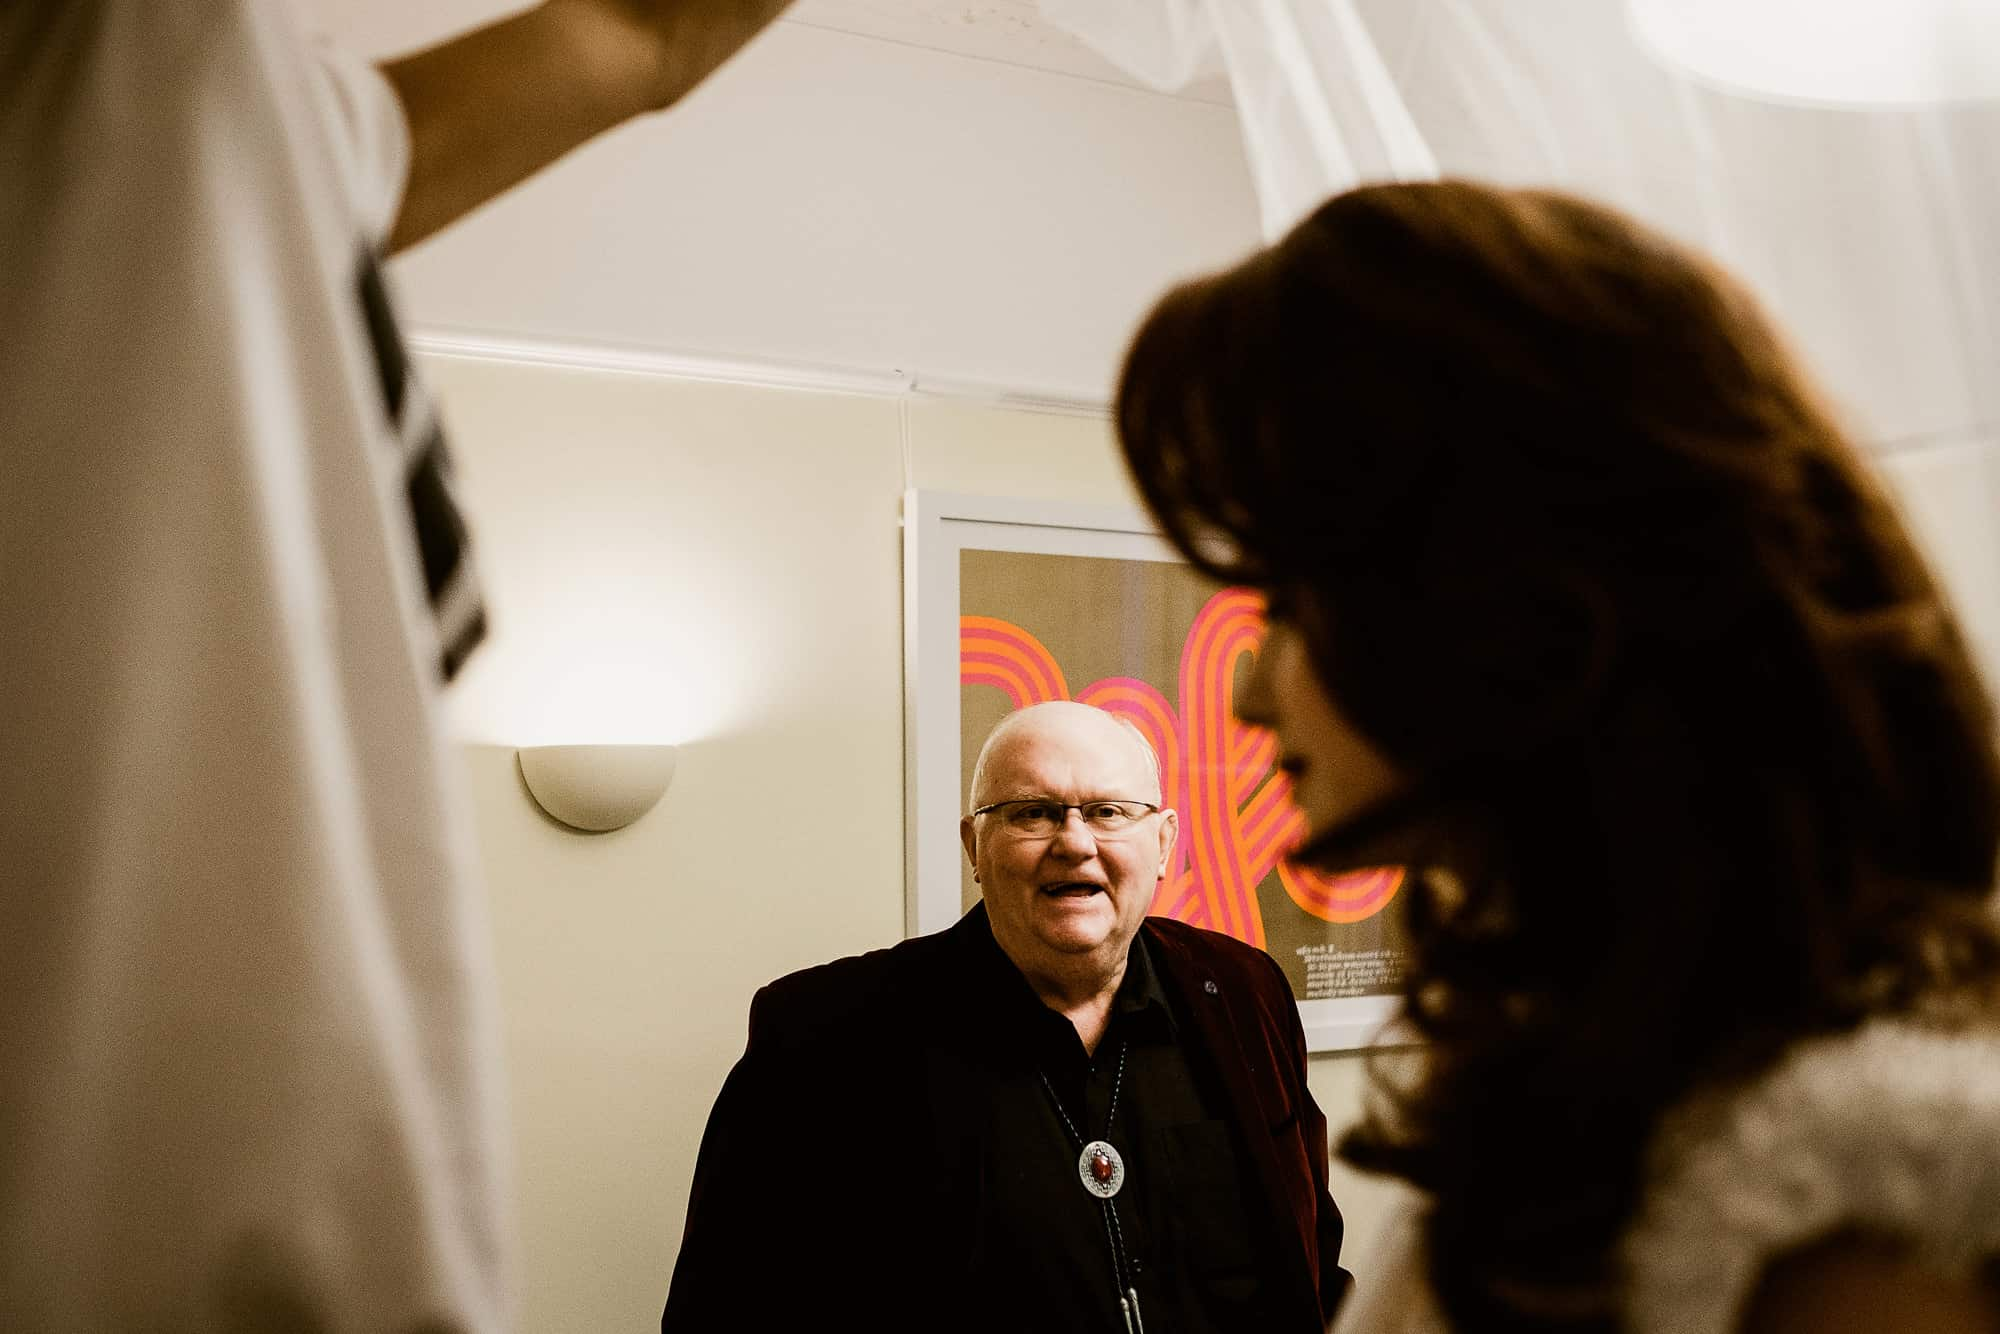 st-stephens-wedding-photographer-matt-tyler-0019